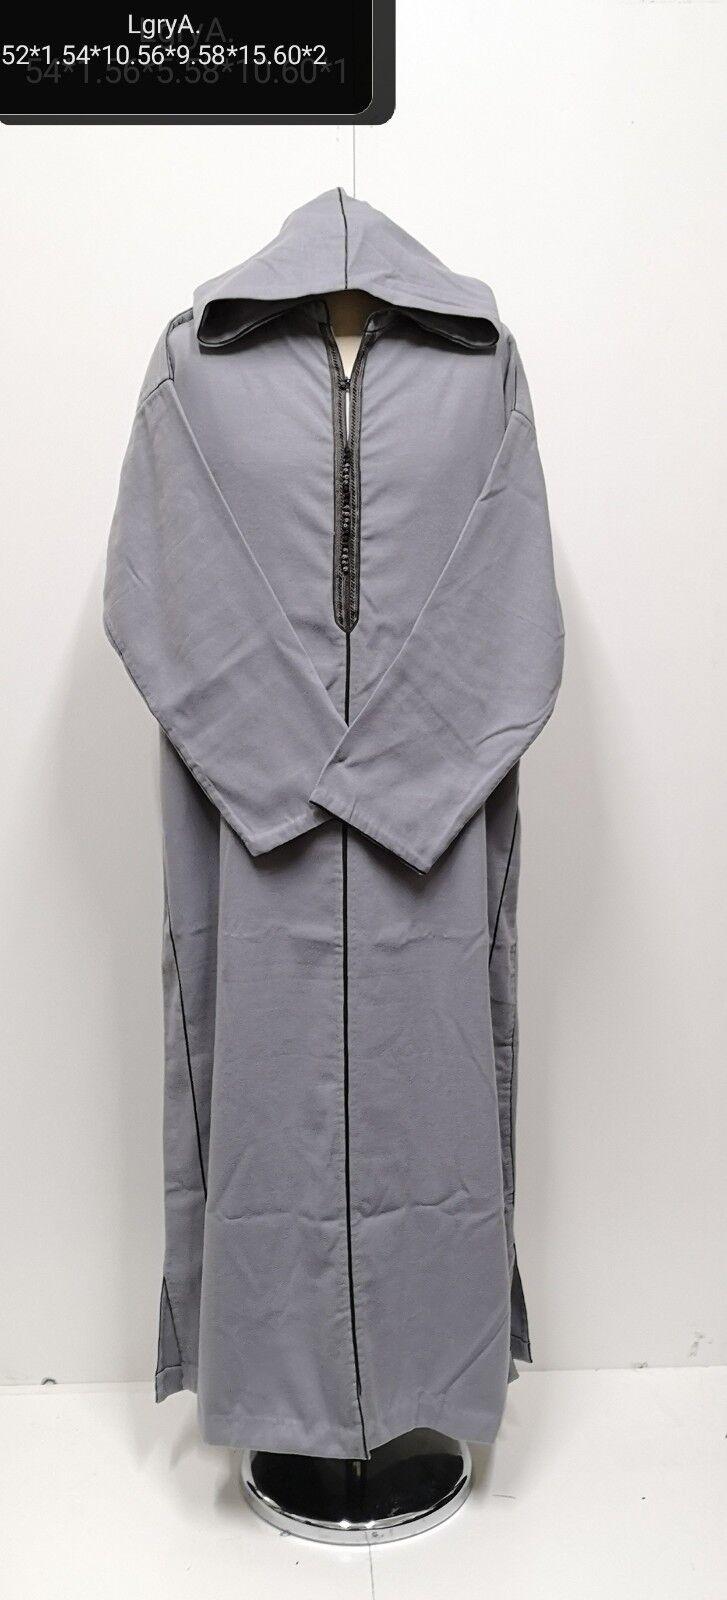 Größes 52,54&56 Men MGoldccan  winter winter winter wool hooded thobe Djelleba jubba-New Arrival | Billig  | Feine Verarbeitung  a536e3